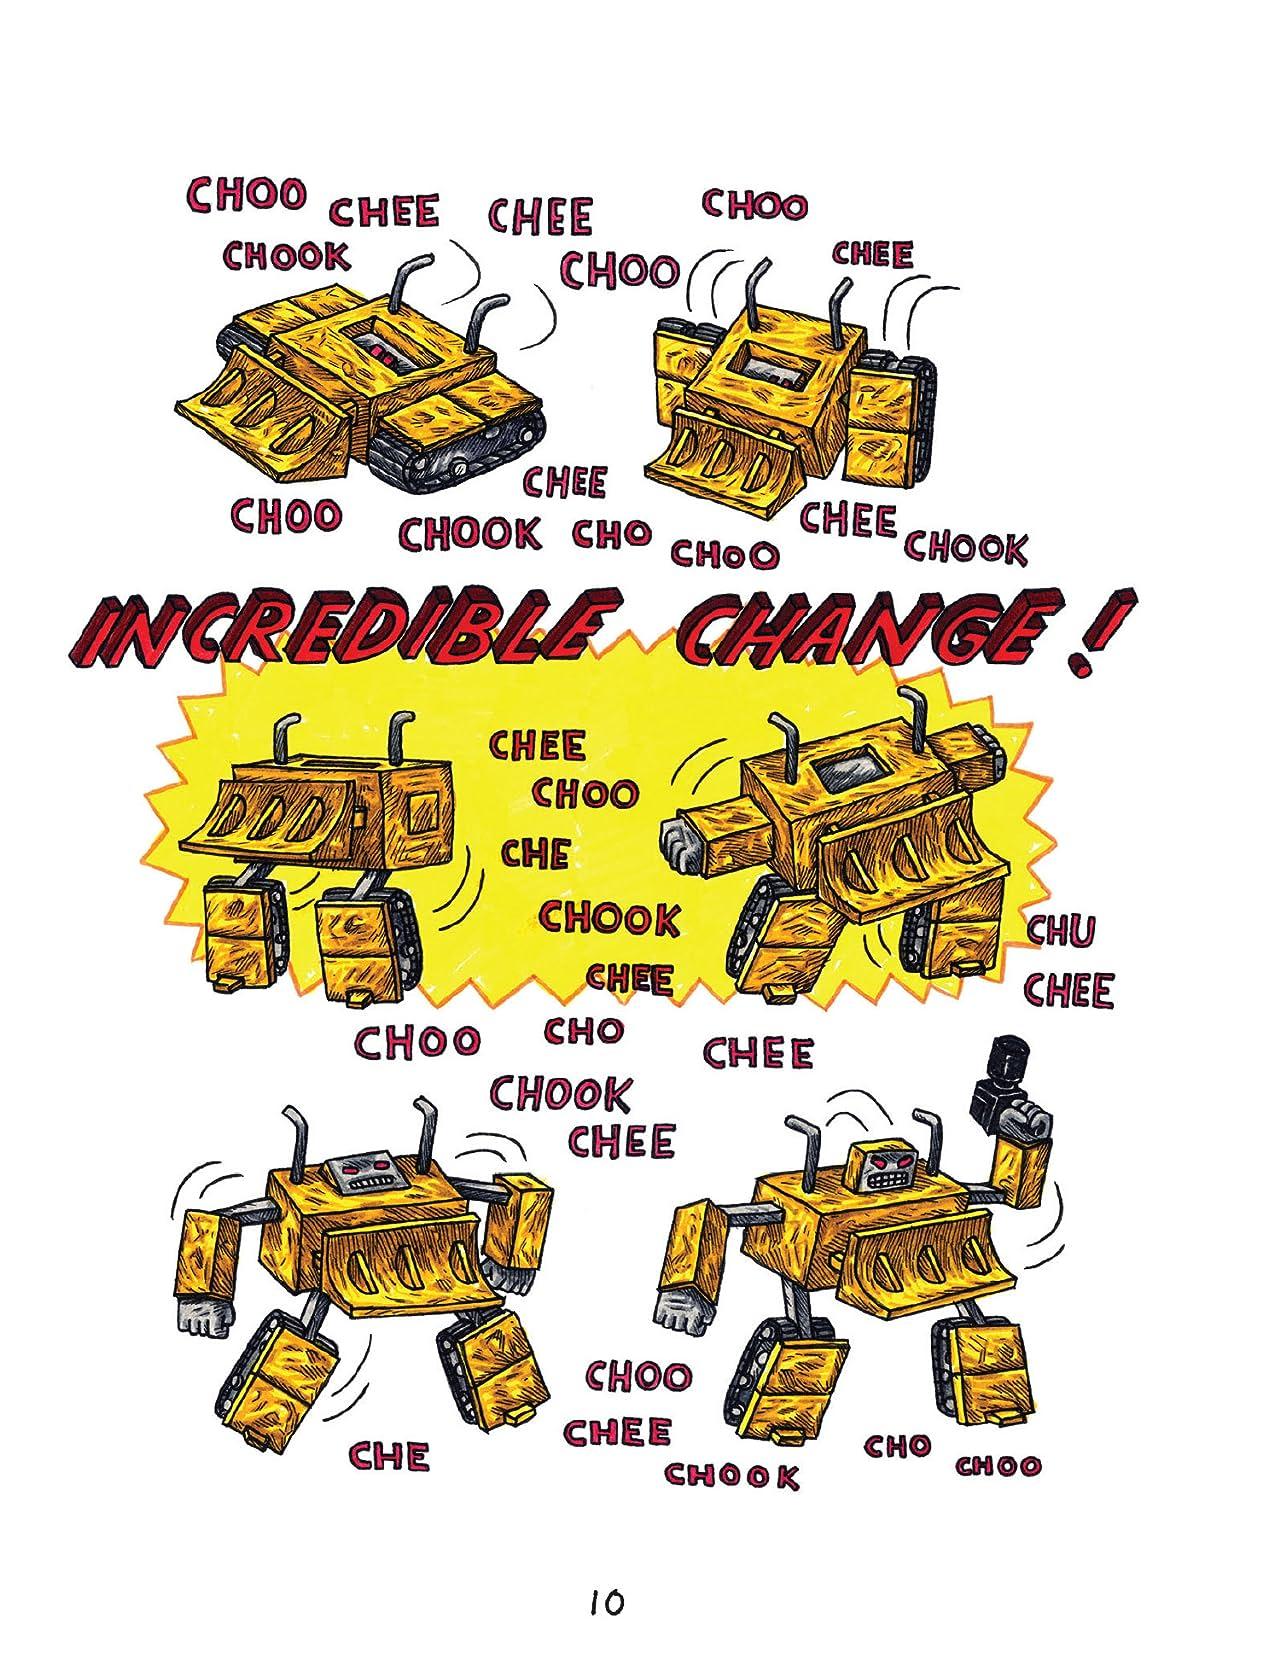 Incredible Change-Bots: Two Point Something Something